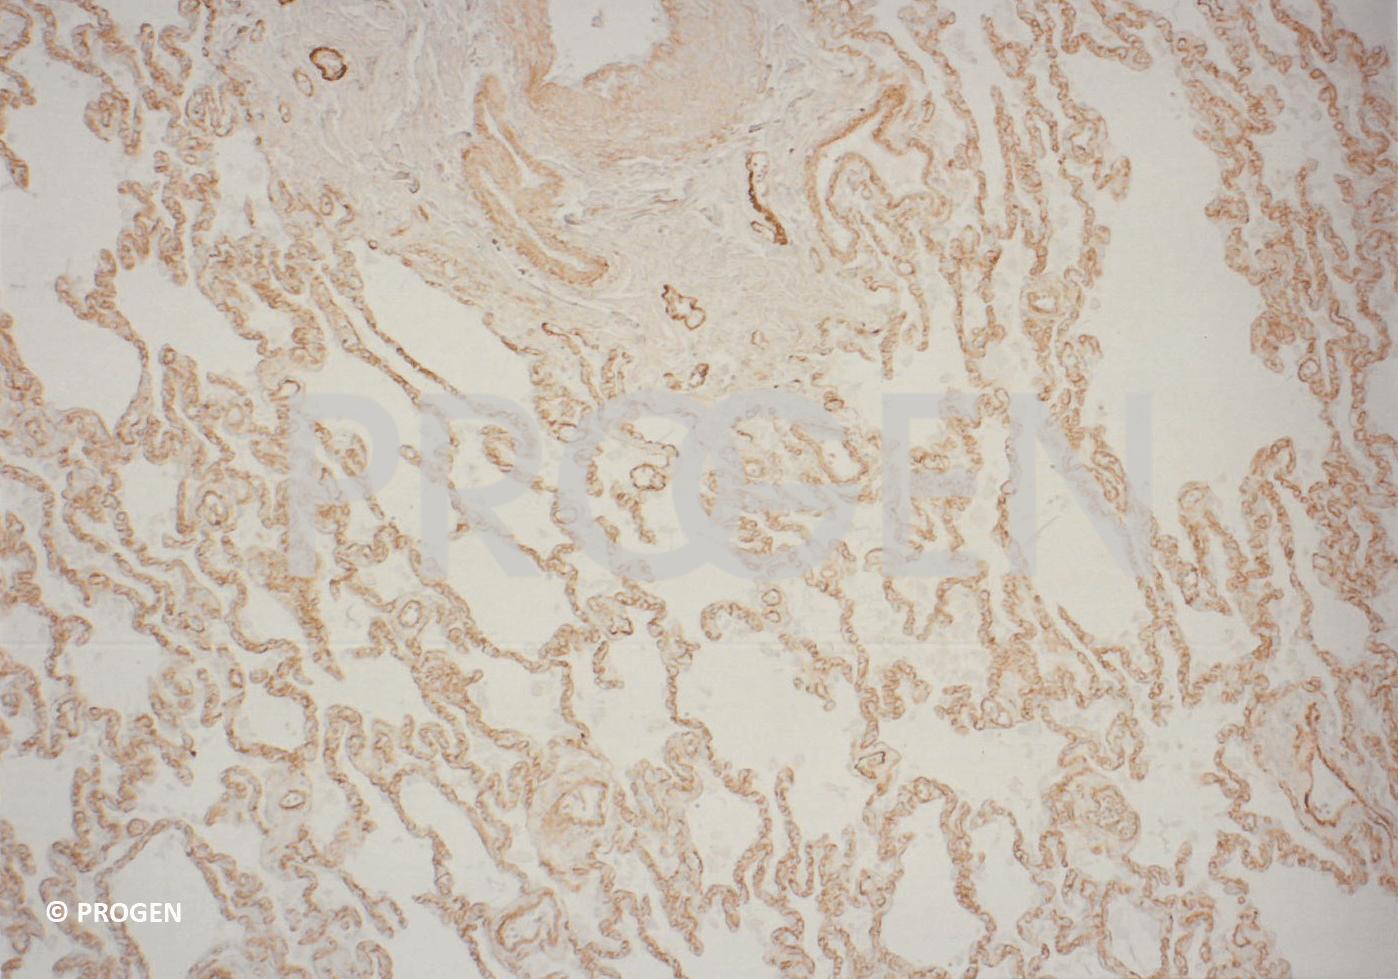 anti-Collagen Type IV rabbit polyclonal, serum